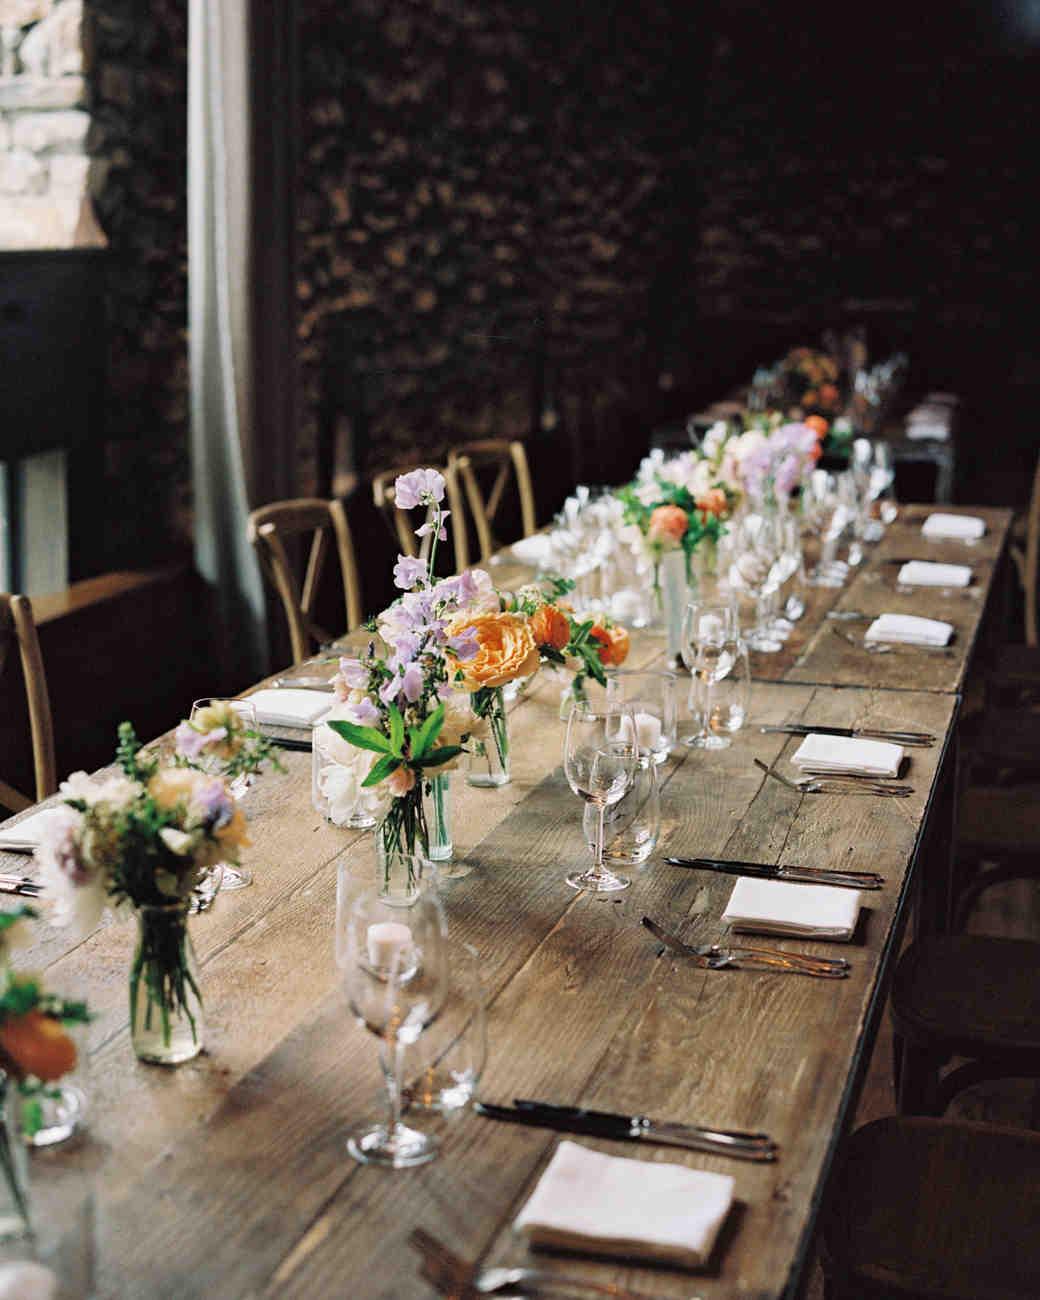 sydney-christina-wedding-table-090-s111743-0115.jpg